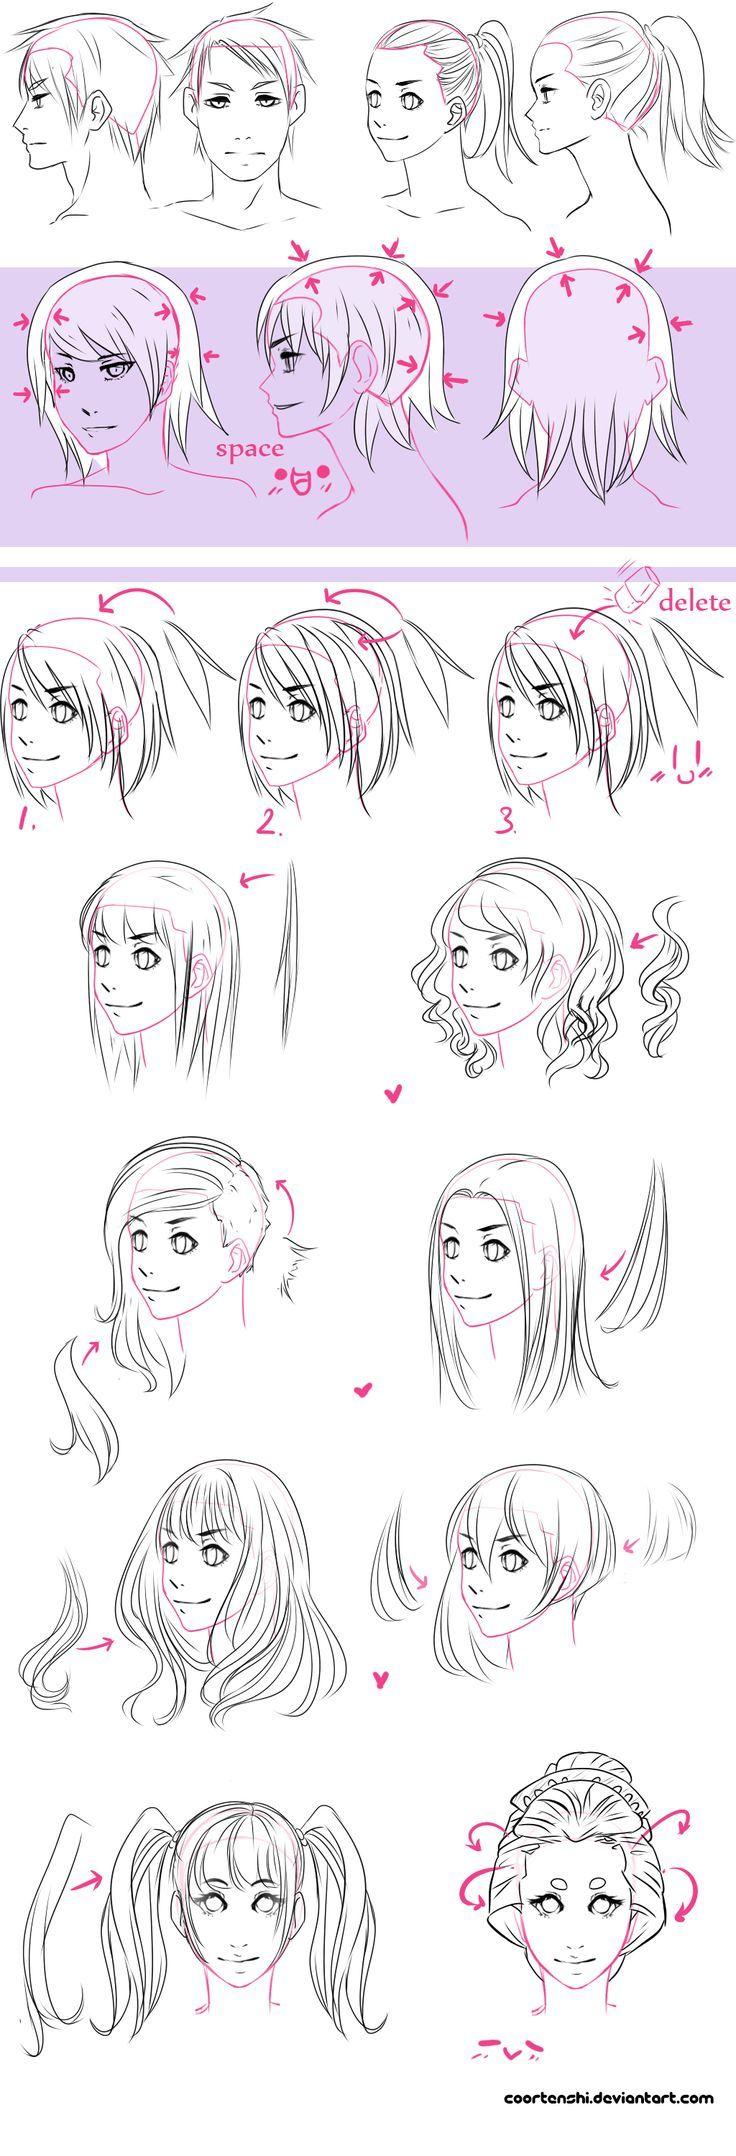 22 Popular Medium Hairstyles For Women 2017 Shoulder Length Hair Ideas Drawing Hair Tutorial Manga Hair How To Draw Hair